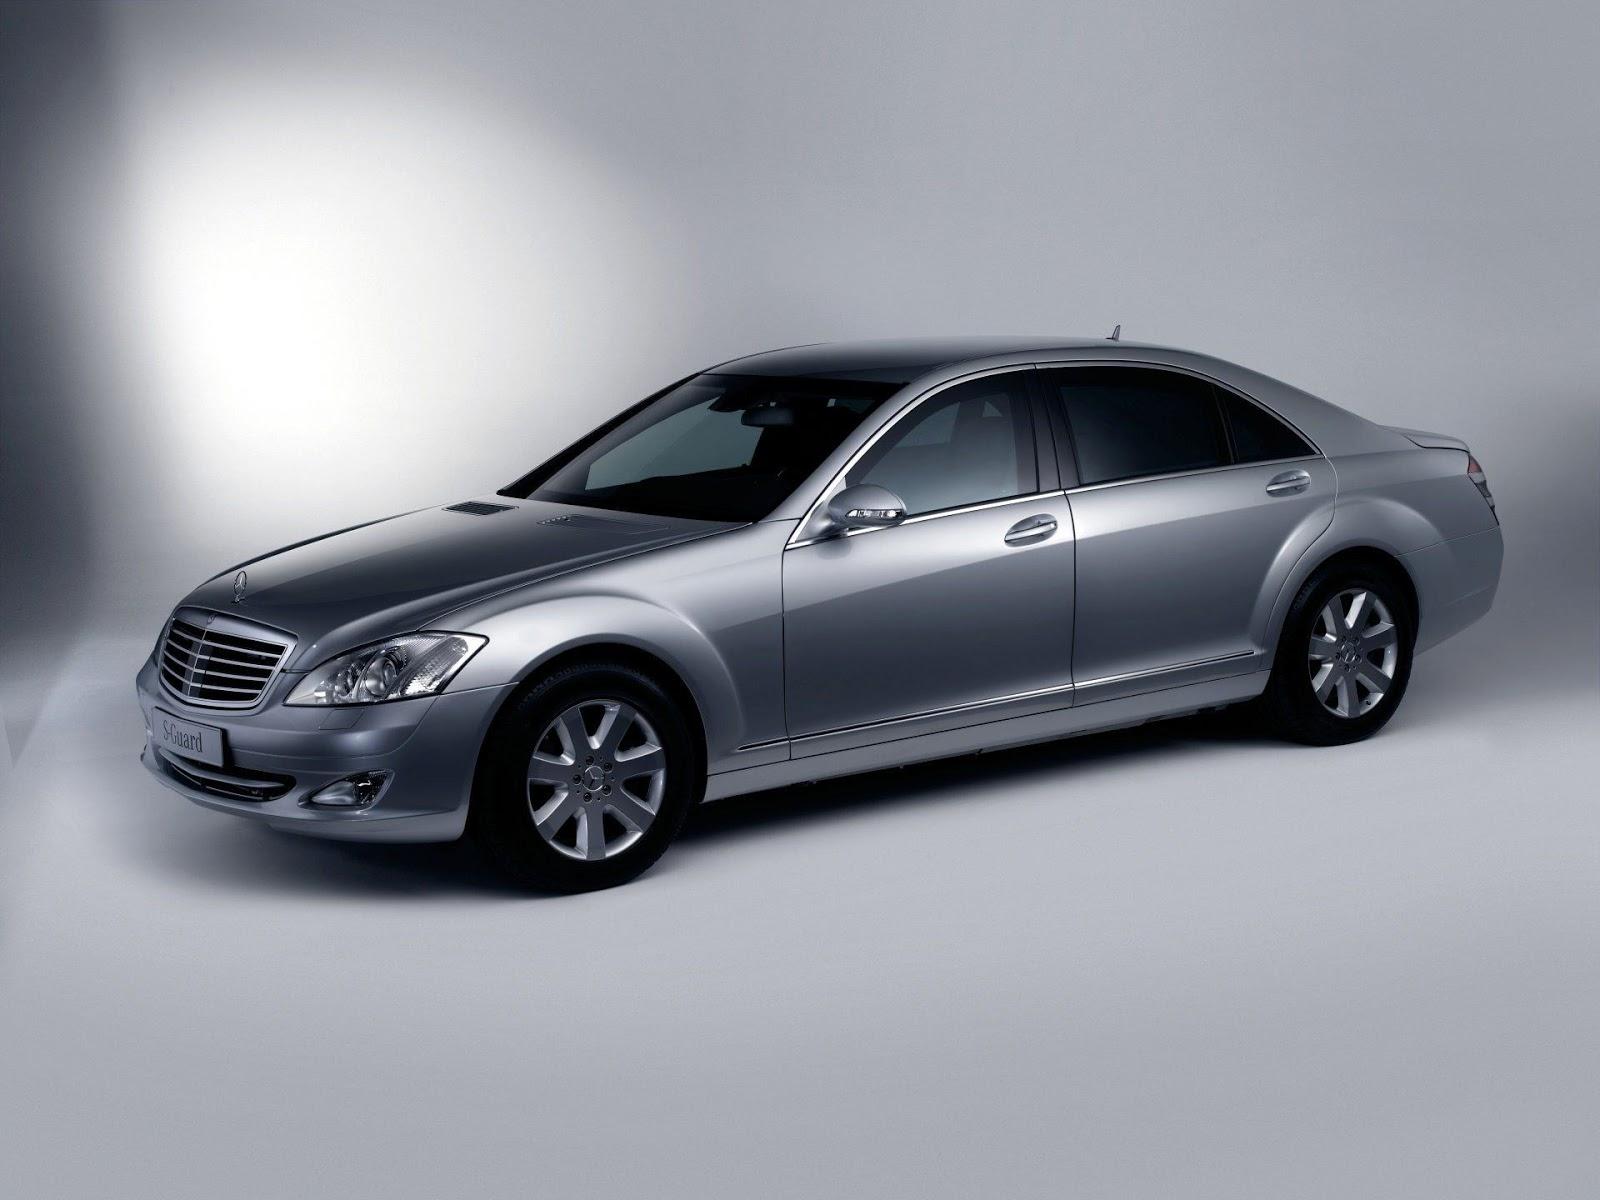 2015 mercedes s600 pullman muscles car wallpaper for 2015 mercedes benz s 600